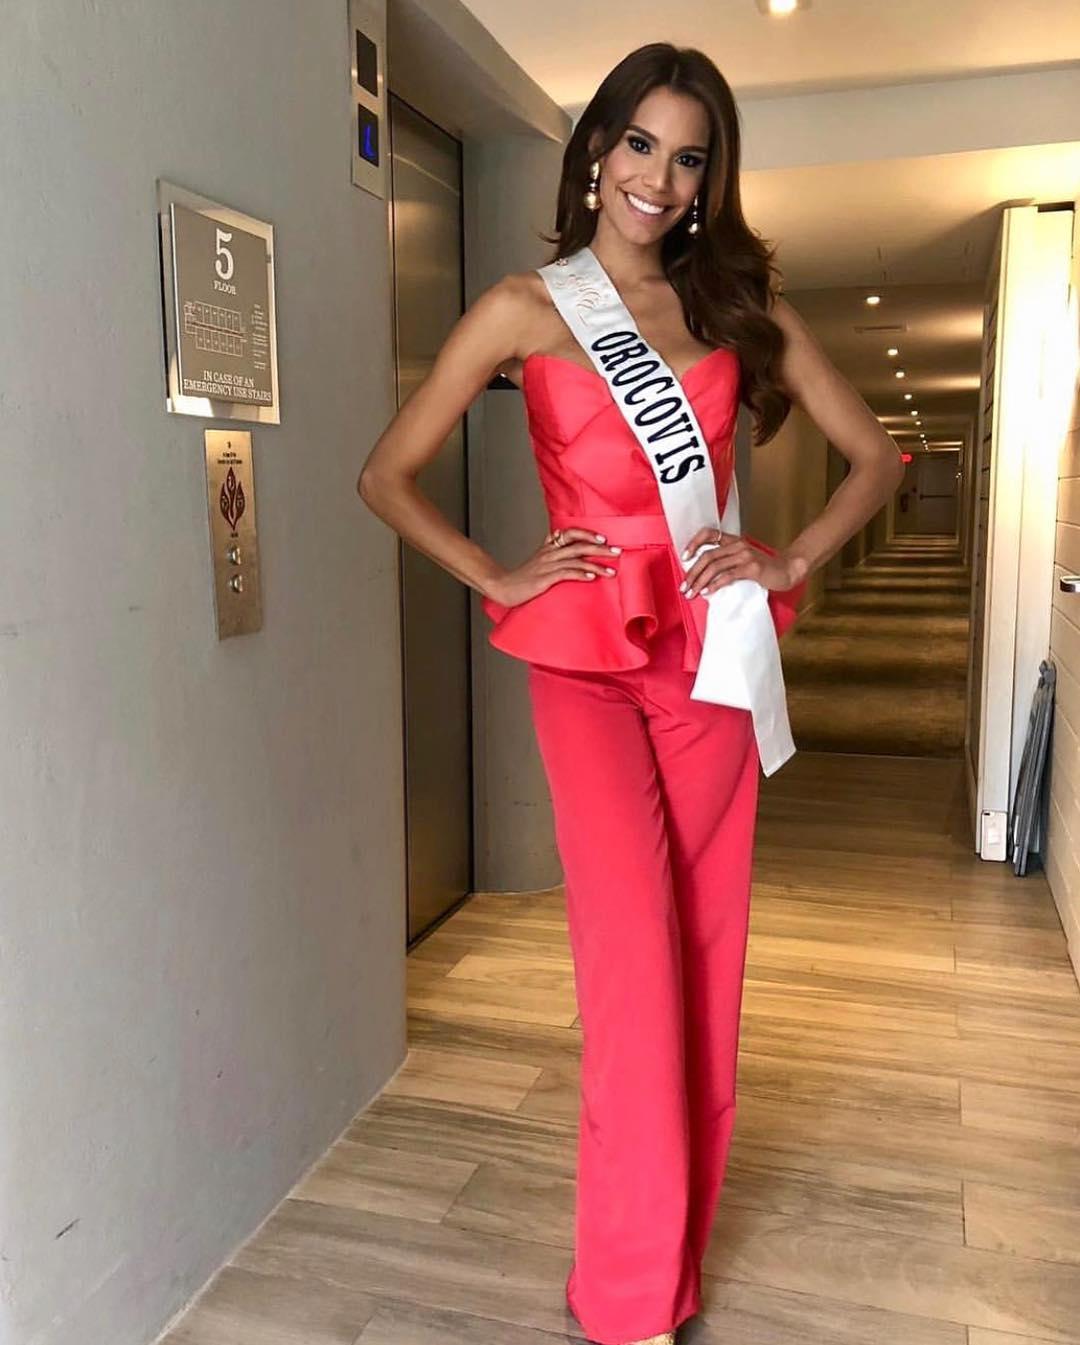 mayde columna, miss orocovis universe 2018/miss intercontinental 2010. - Página 4 2eq6pf10